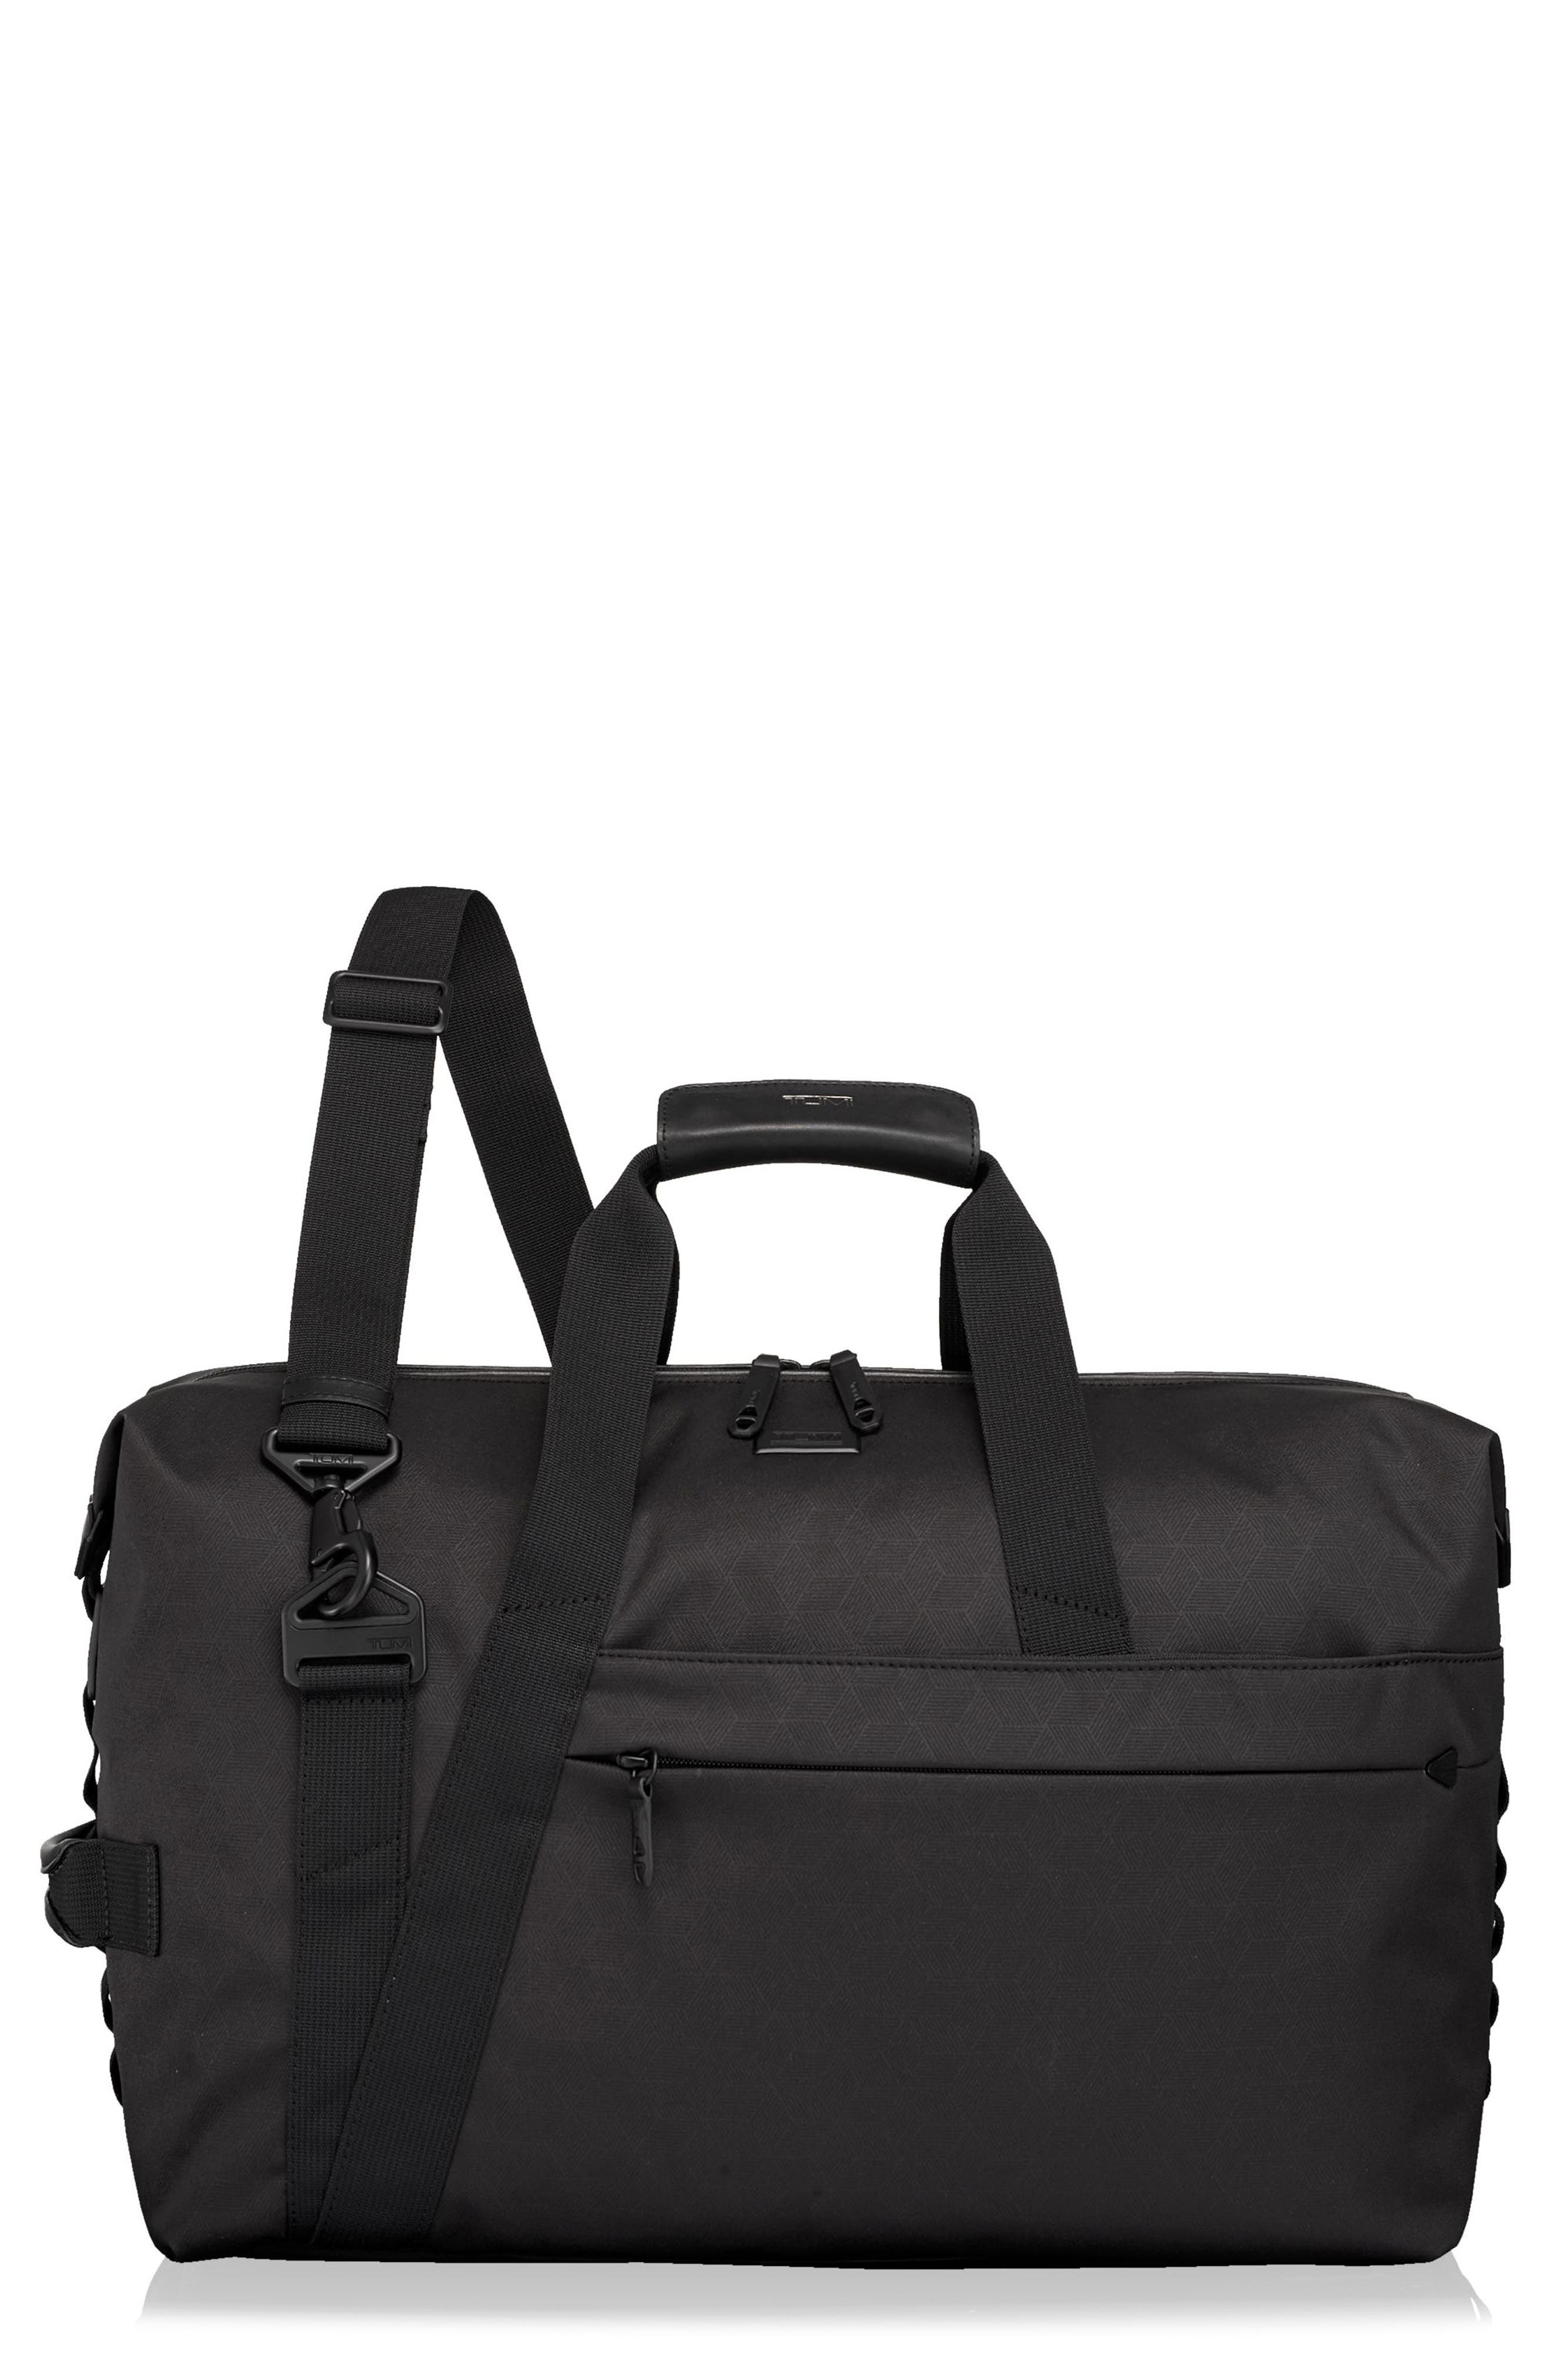 Sonoma Duffel Bag,                         Main,                         color, BLACK